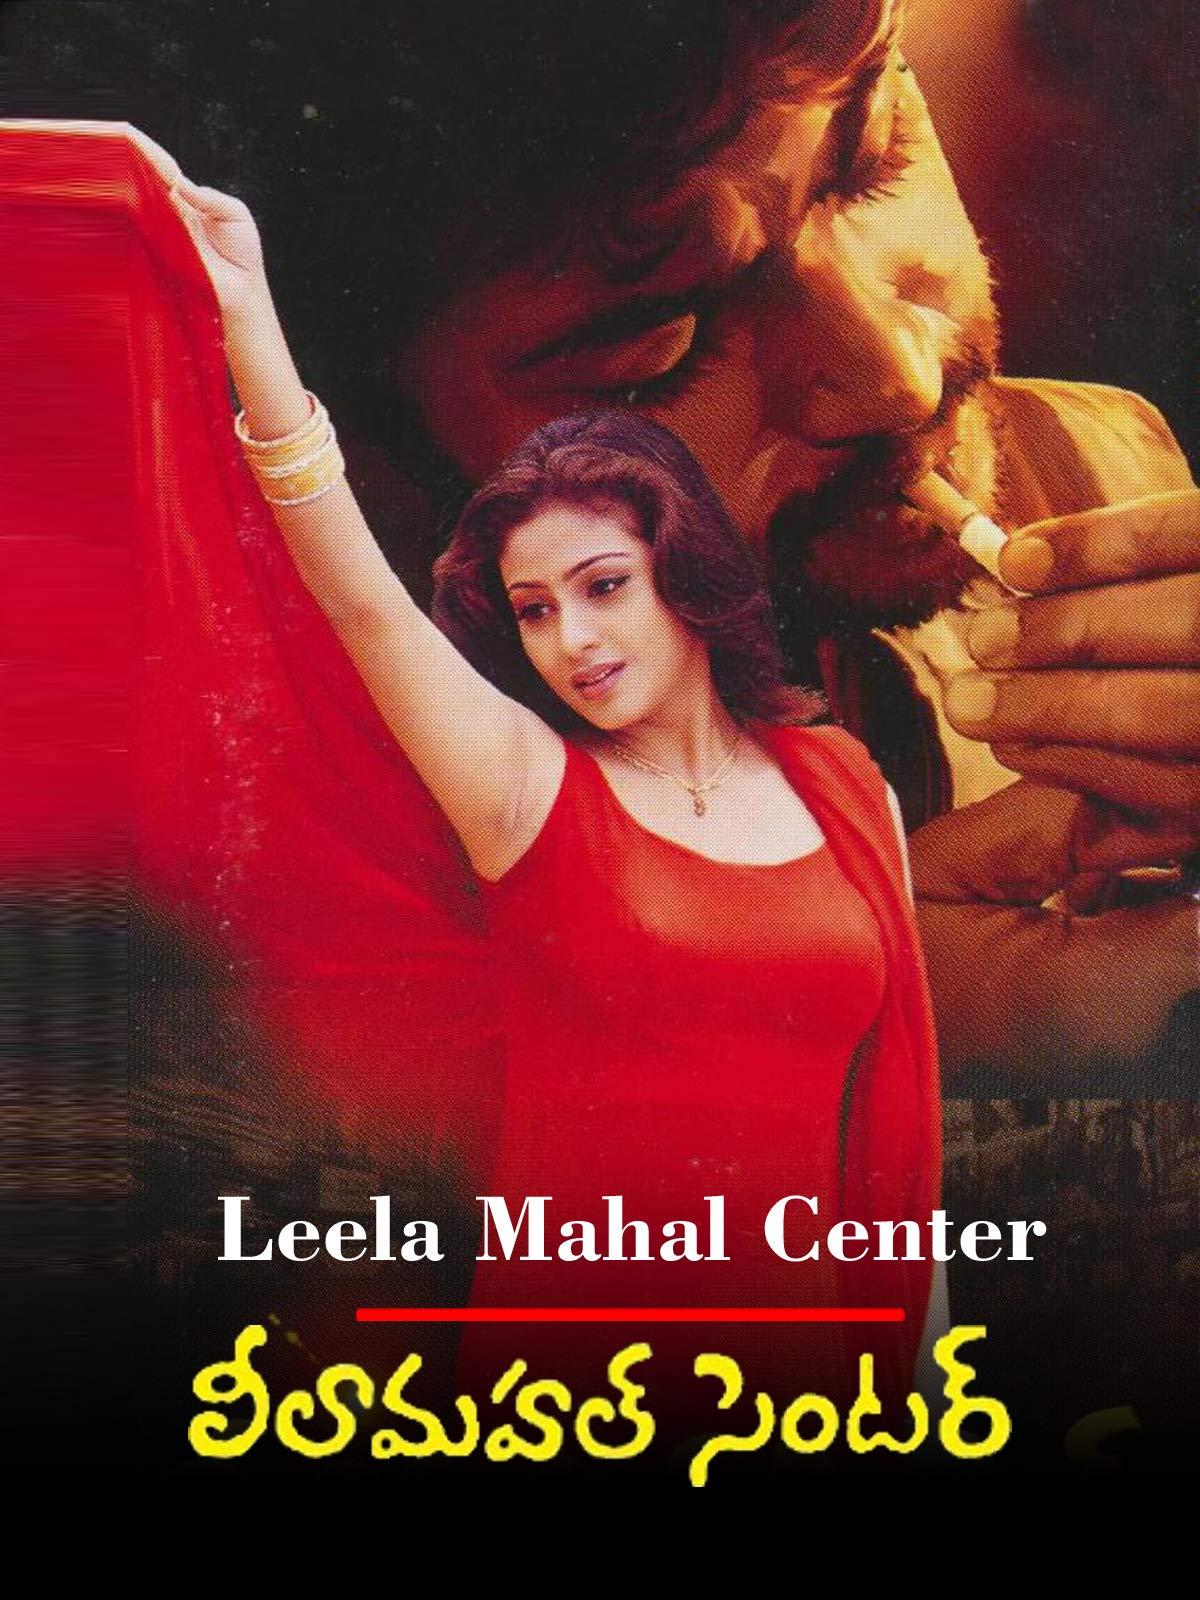 Leela Mahal Center